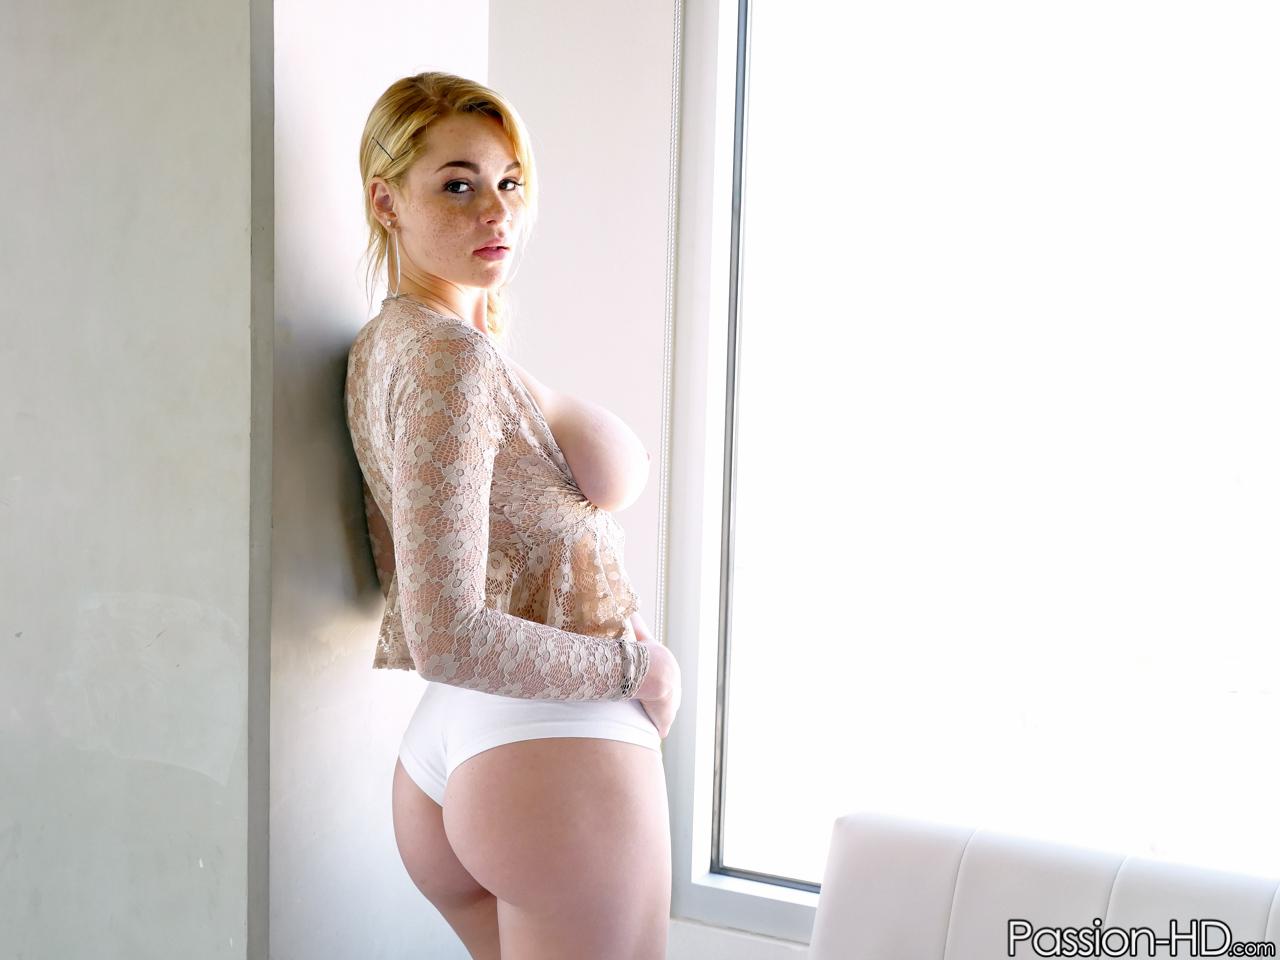 girls Spectacular boobs naked